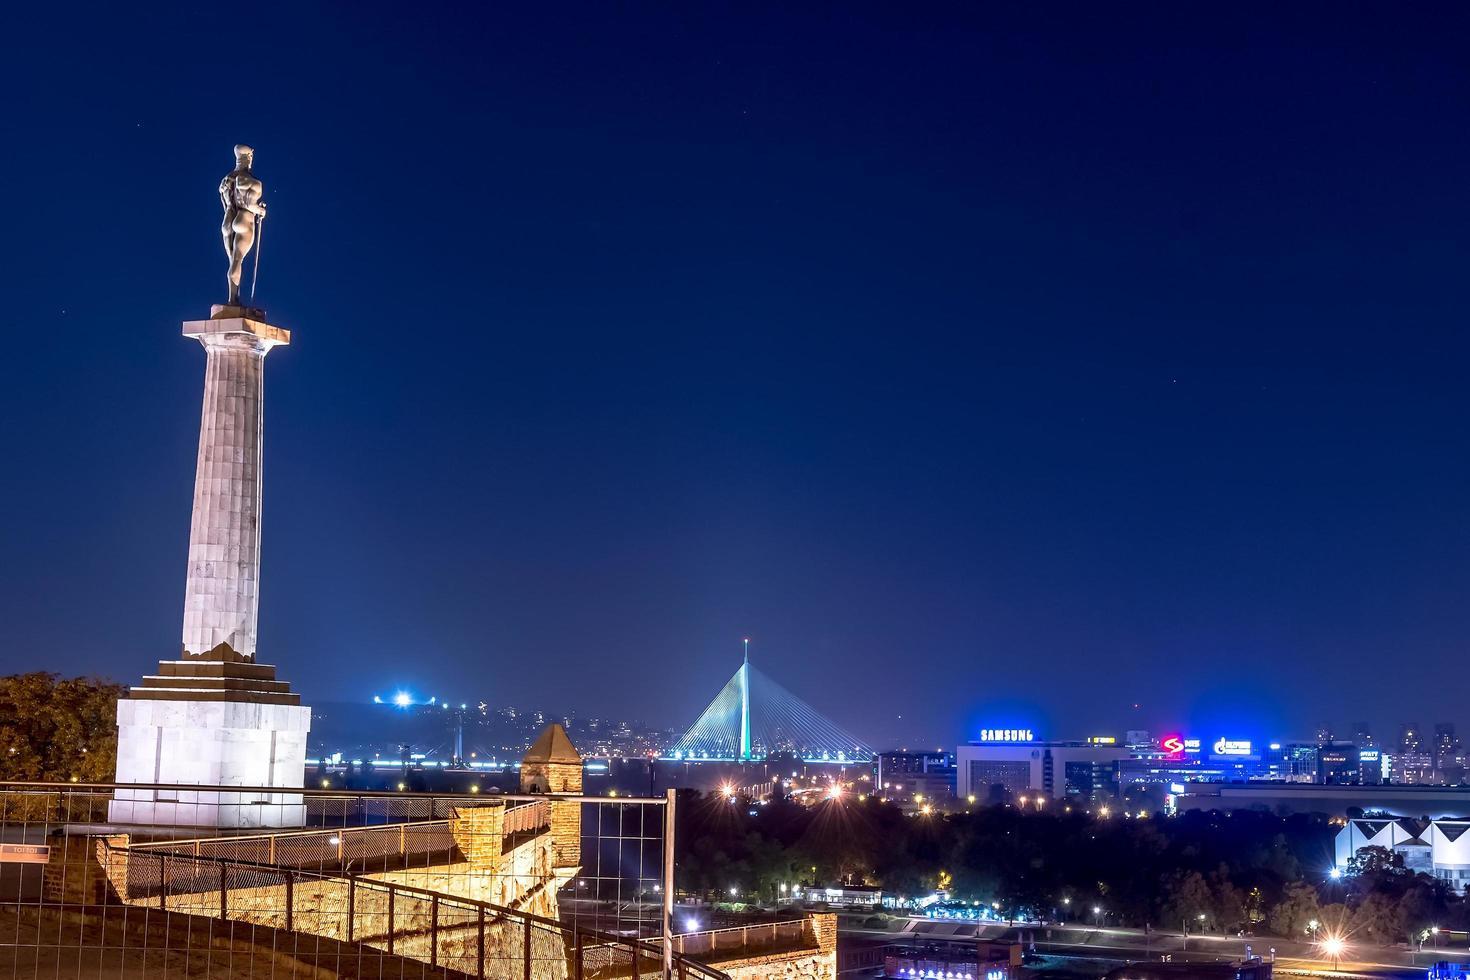 serbia 2015-- belgrado visto de noche desde la fortaleza de kalemegdan foto